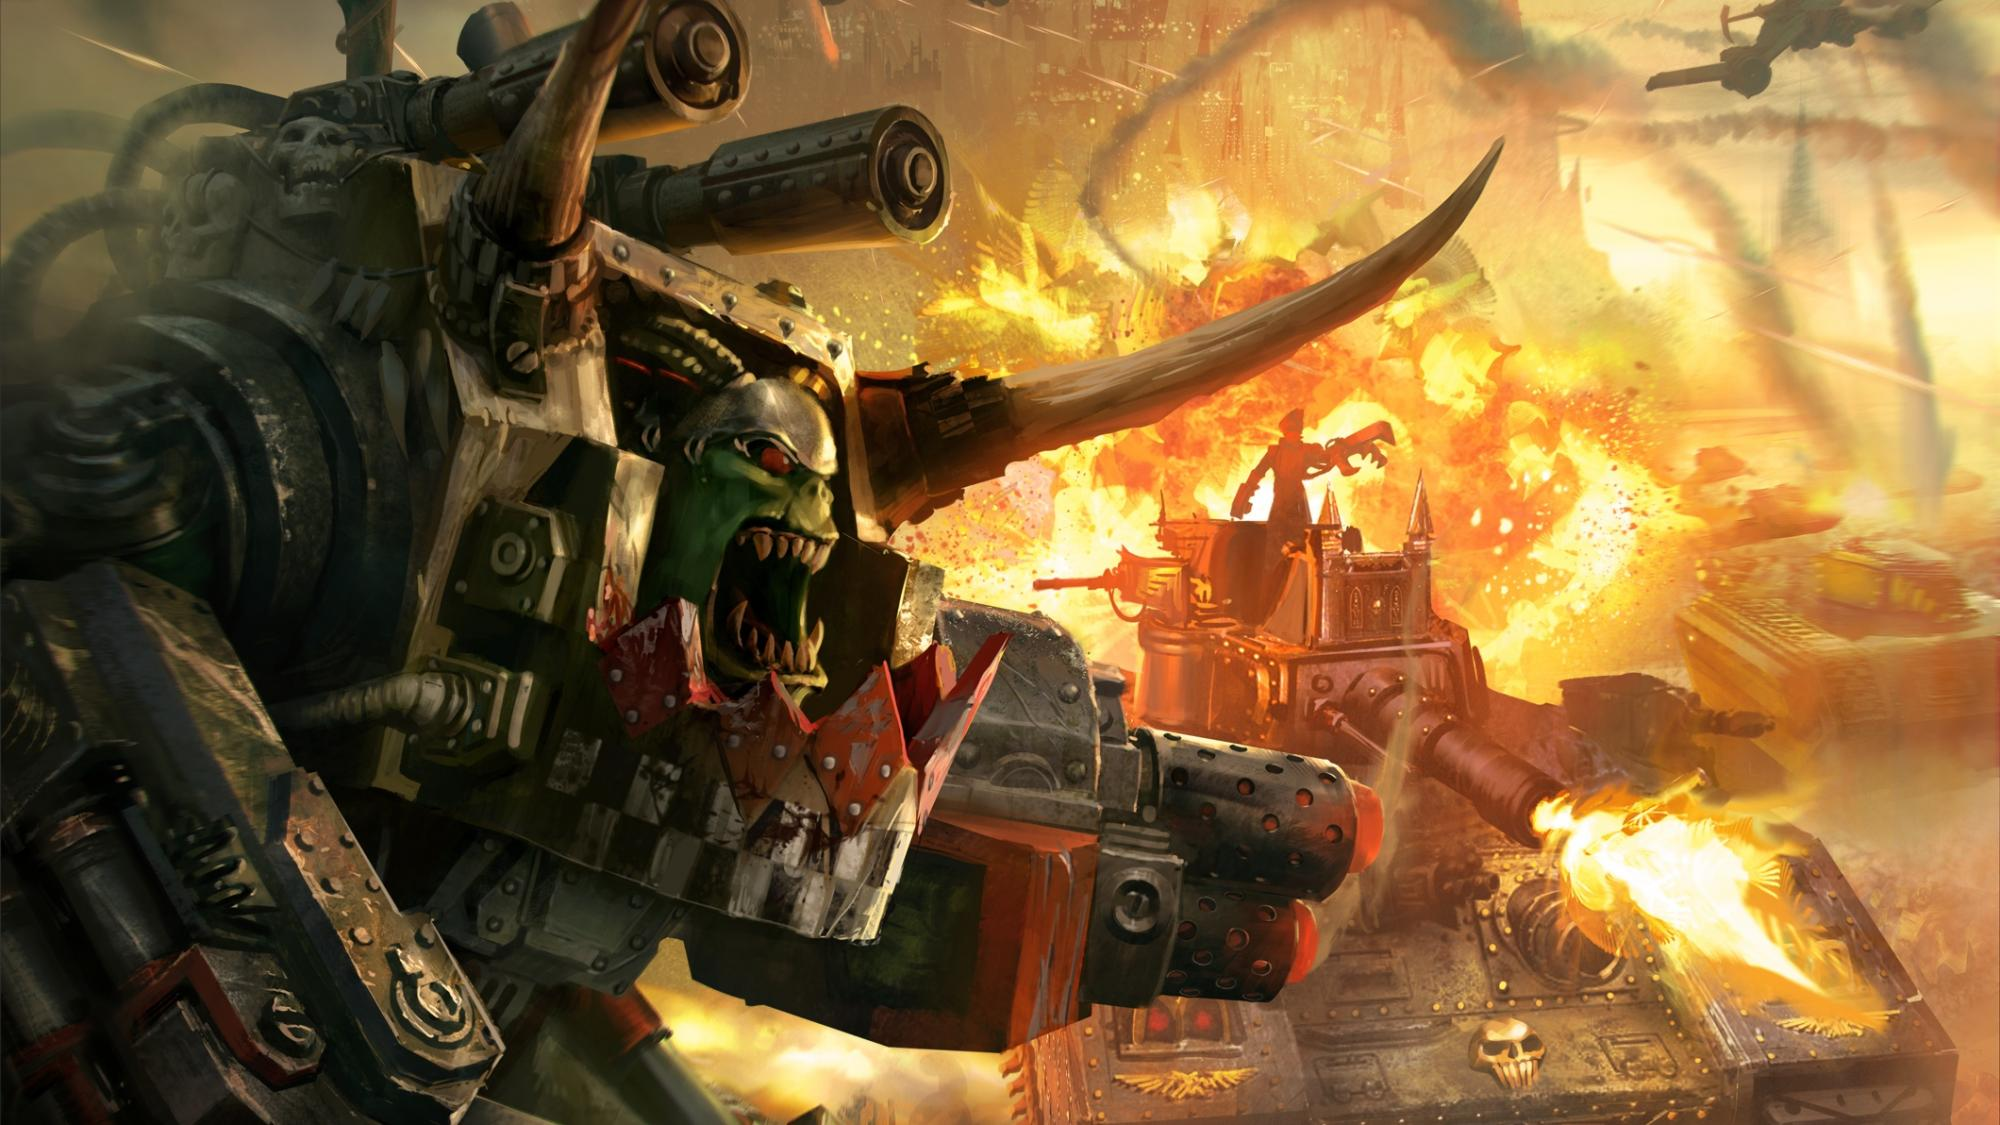 play-warhammer_rick-jpg